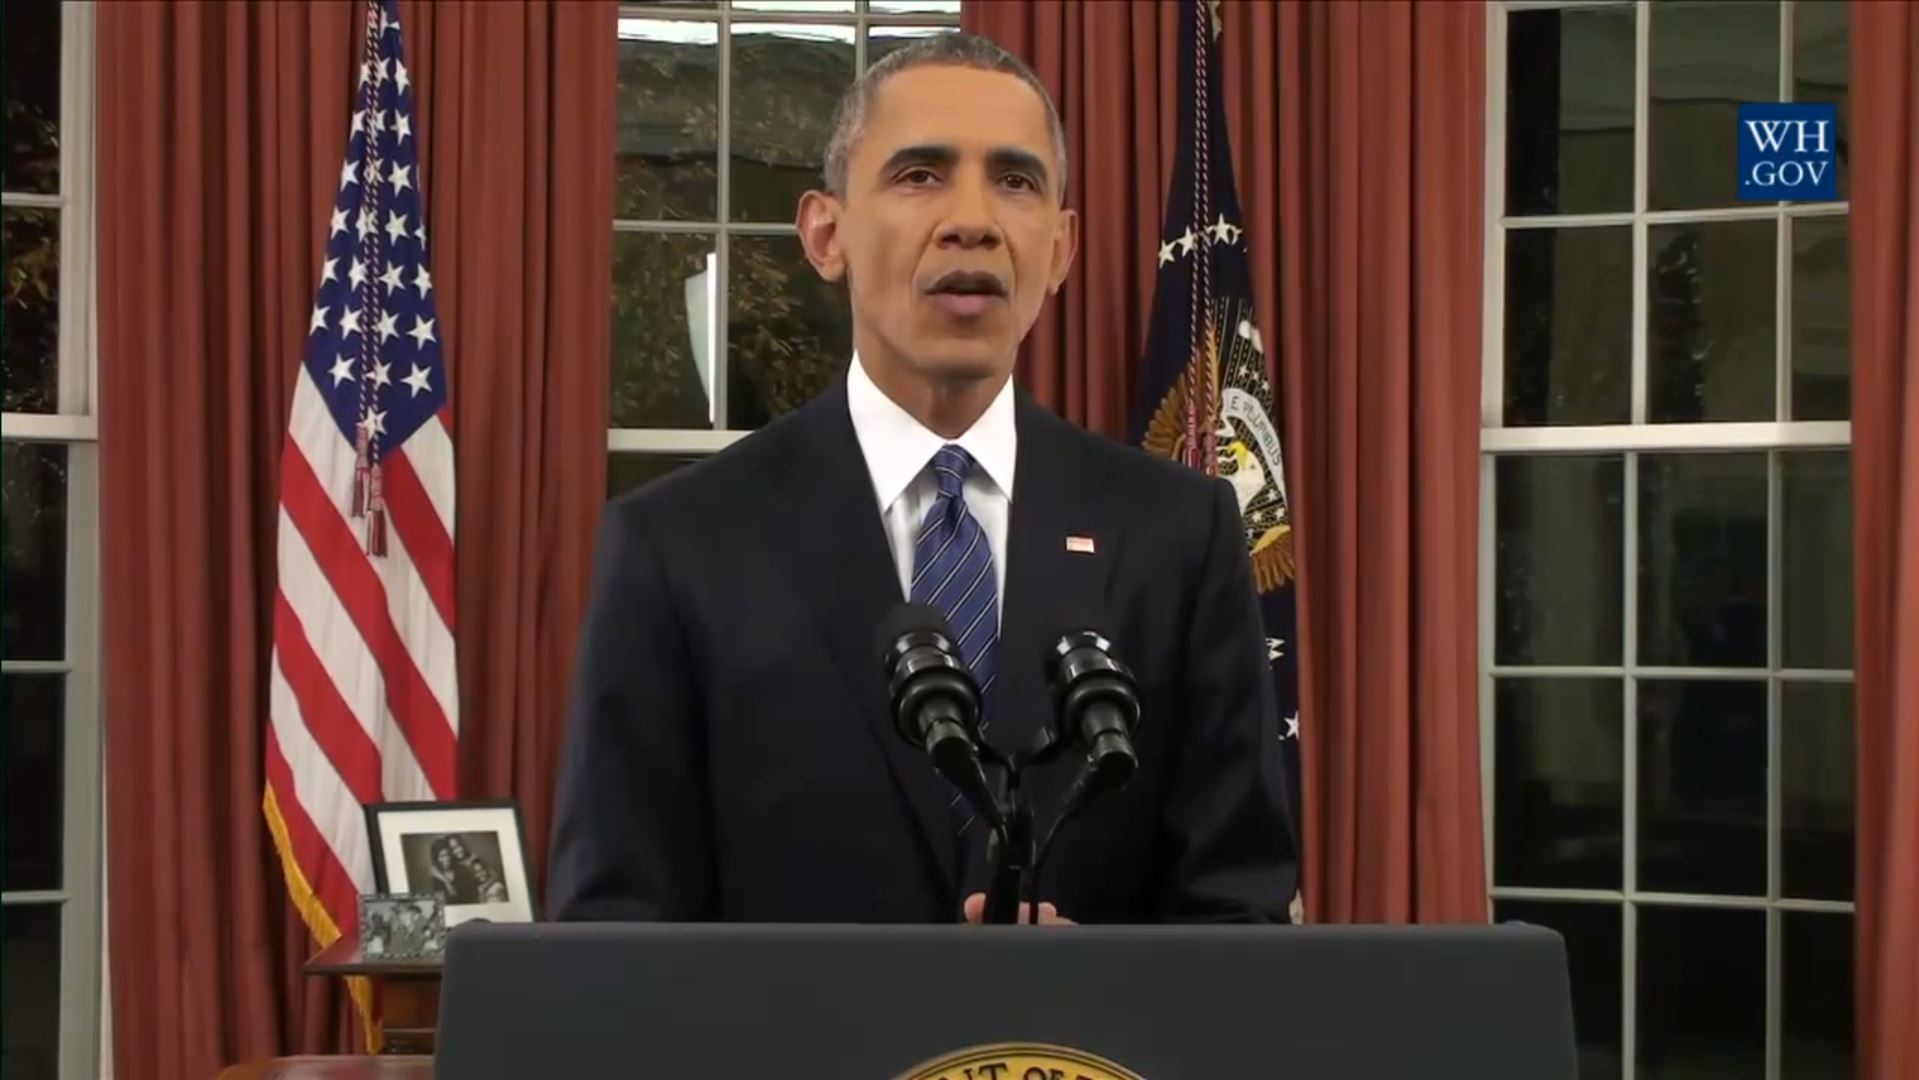 Video still of President Barack Obama's Oval Office Address - Dec. 6, 2015